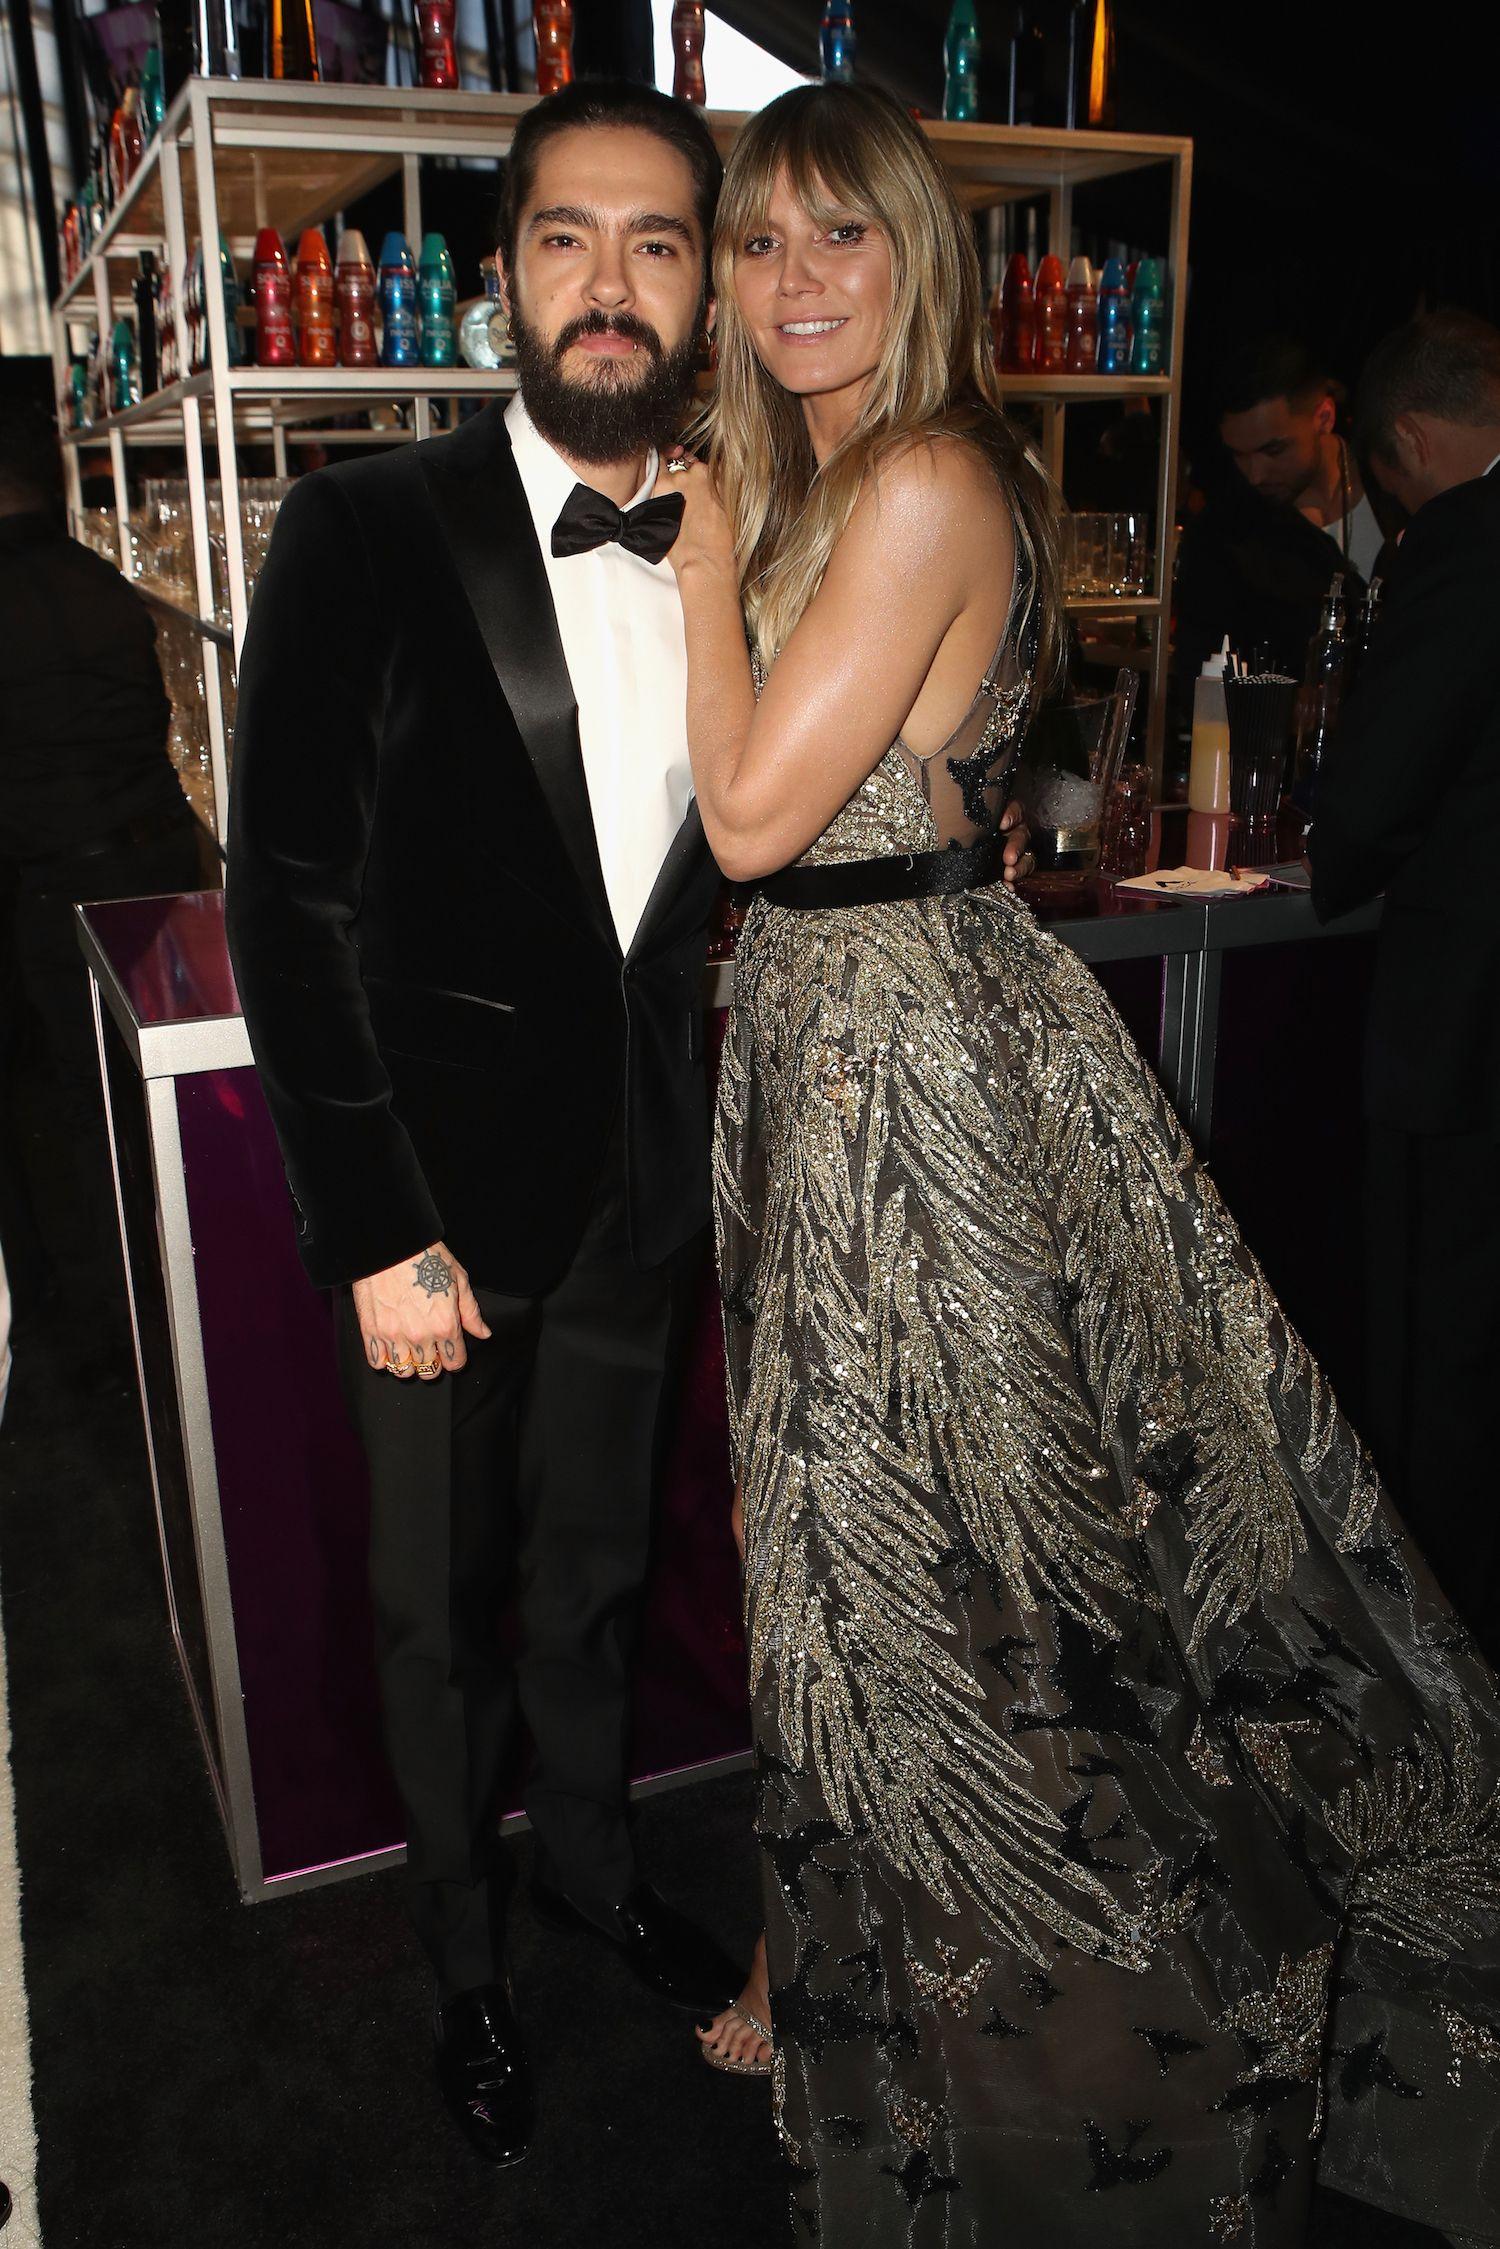 Heidi Klum and Tom Kaulitz Heidi Klum and Tom Kaulitz attend the 27th annual Elton John AIDS Foundation Academy Awards viewing party celebrating EJAF and the 91st annual Academy Awards on February 24.